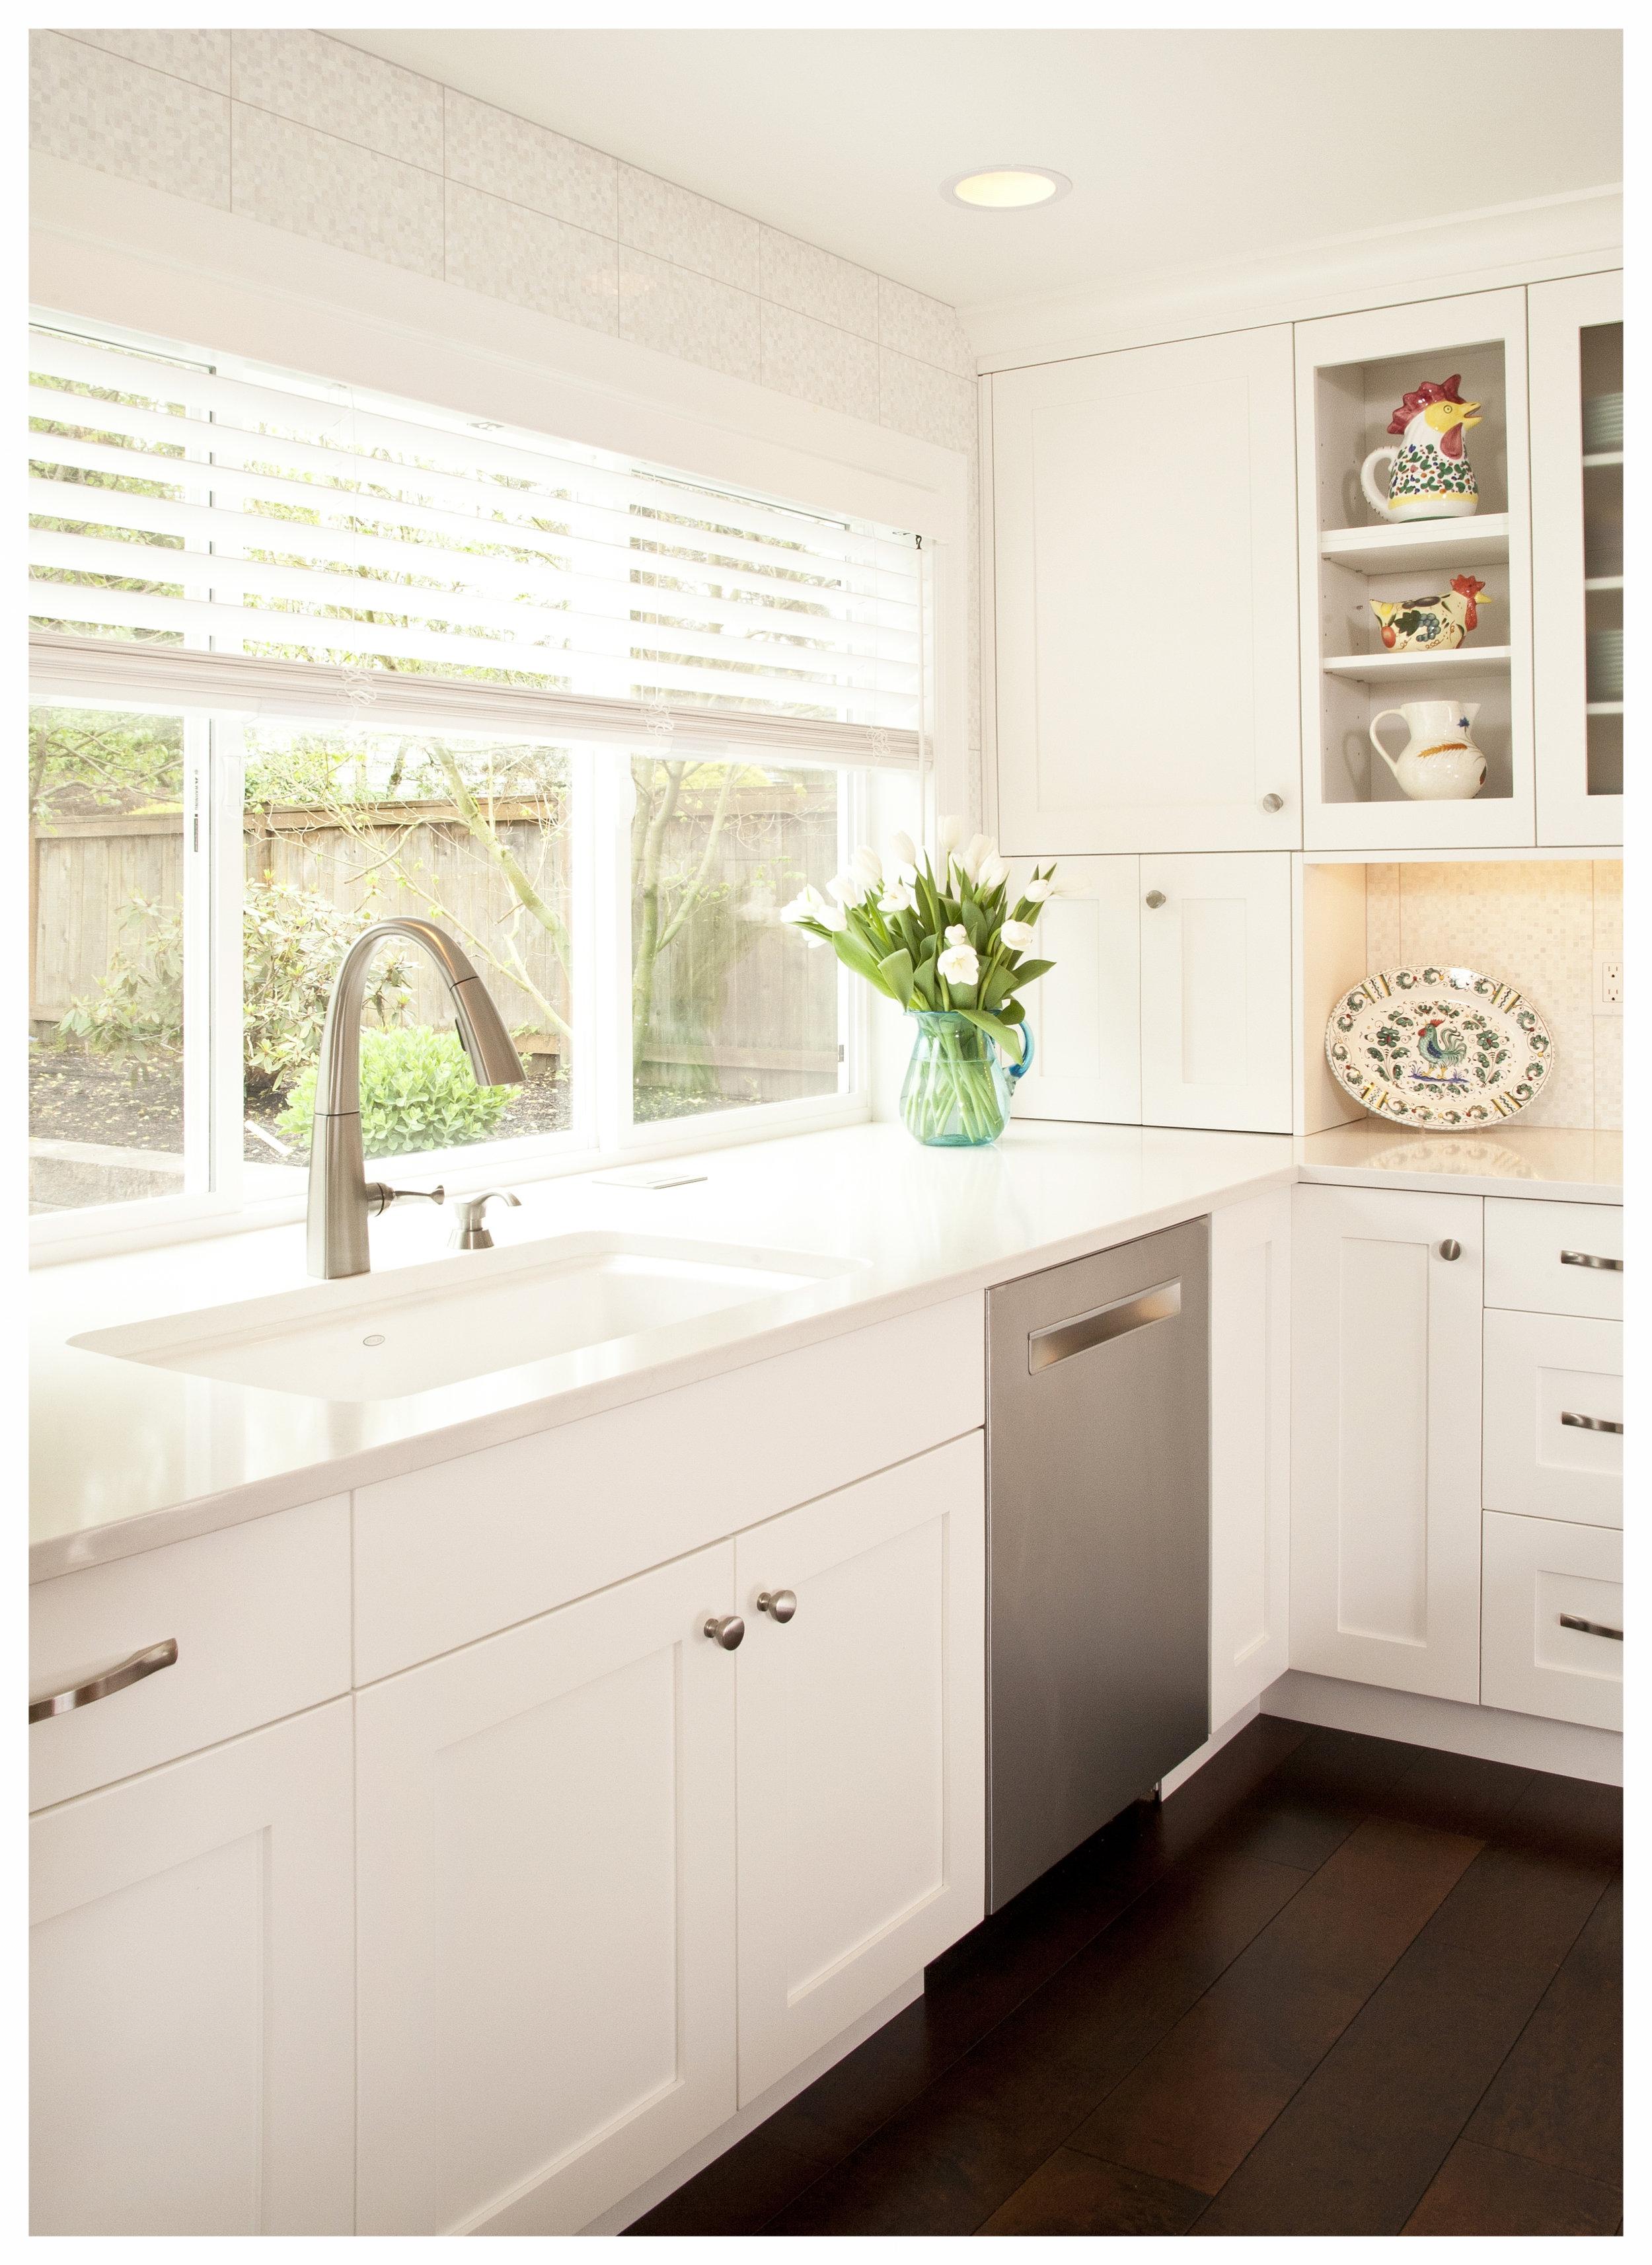 Bellevue Newport Shores Transitional Kitchen 6.jpg